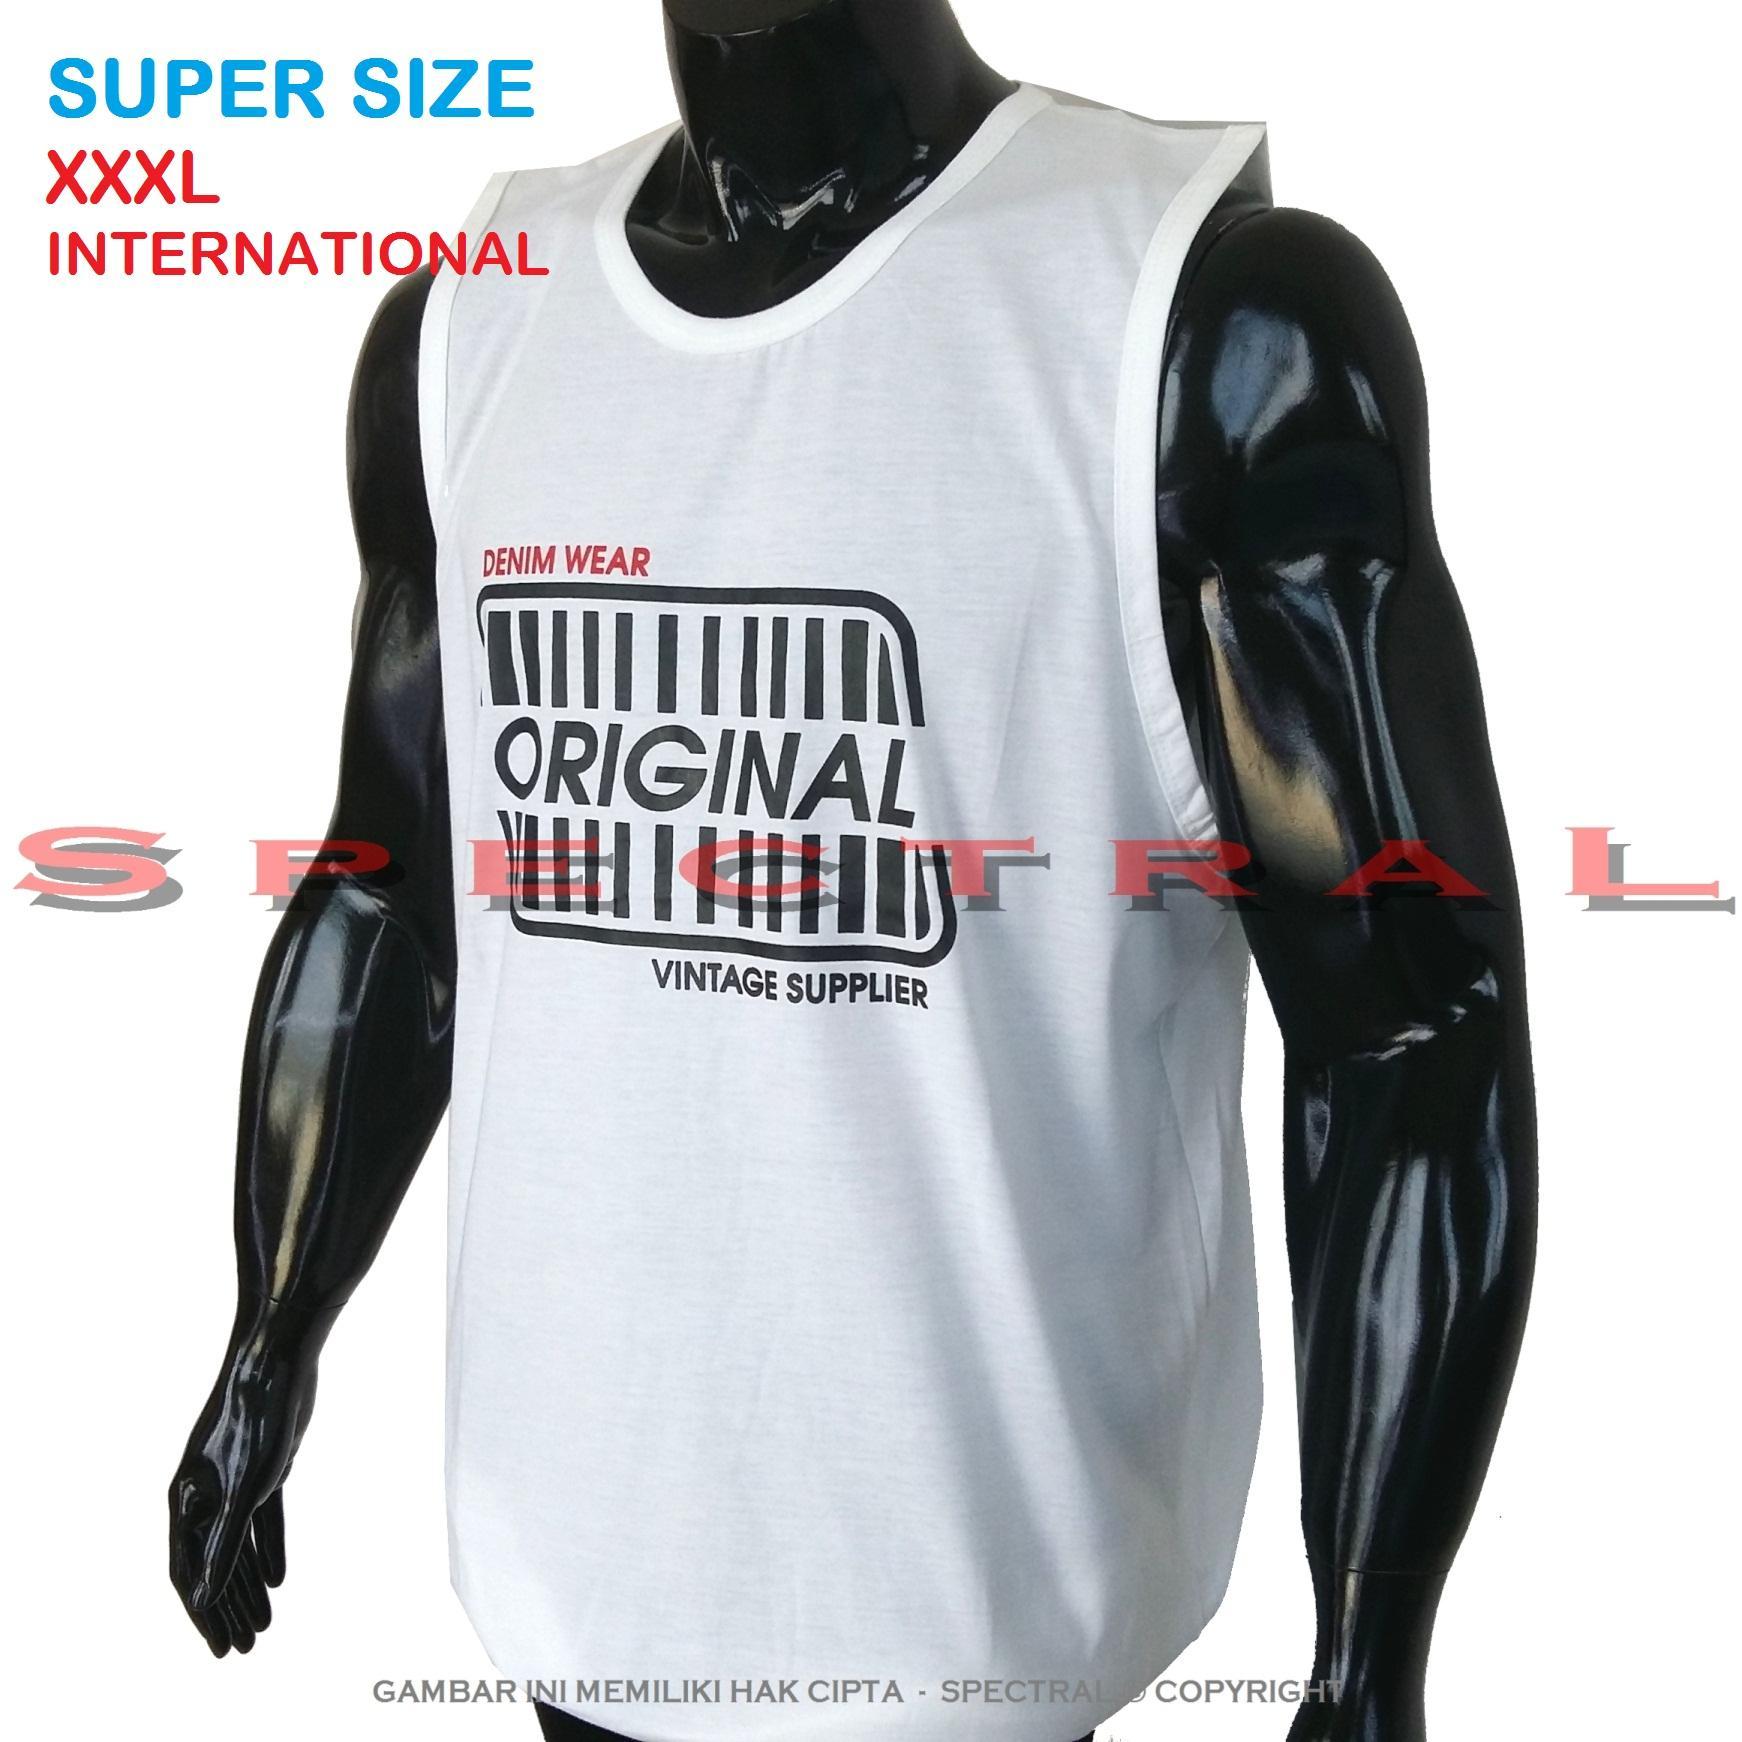 Spectral – 3XL SINGLET SUPER BIG SIZE XXXL 100{55e037da9a70d2f692182bf73e9ad7c46940d20c7297ef2687c837f7bdb7b002} Cotton Combed Kaos Distro Jumbo T-Shirt Fashion Ukuran Besar Polos Celana Olahraga Atasan Pria Wanita Dewasa Bapak Orang Tua Muda Terbaru Gemuk Gendut Sport Bagus Keren Baju Cowo Cewe Pakaian 3L ORIGINAL